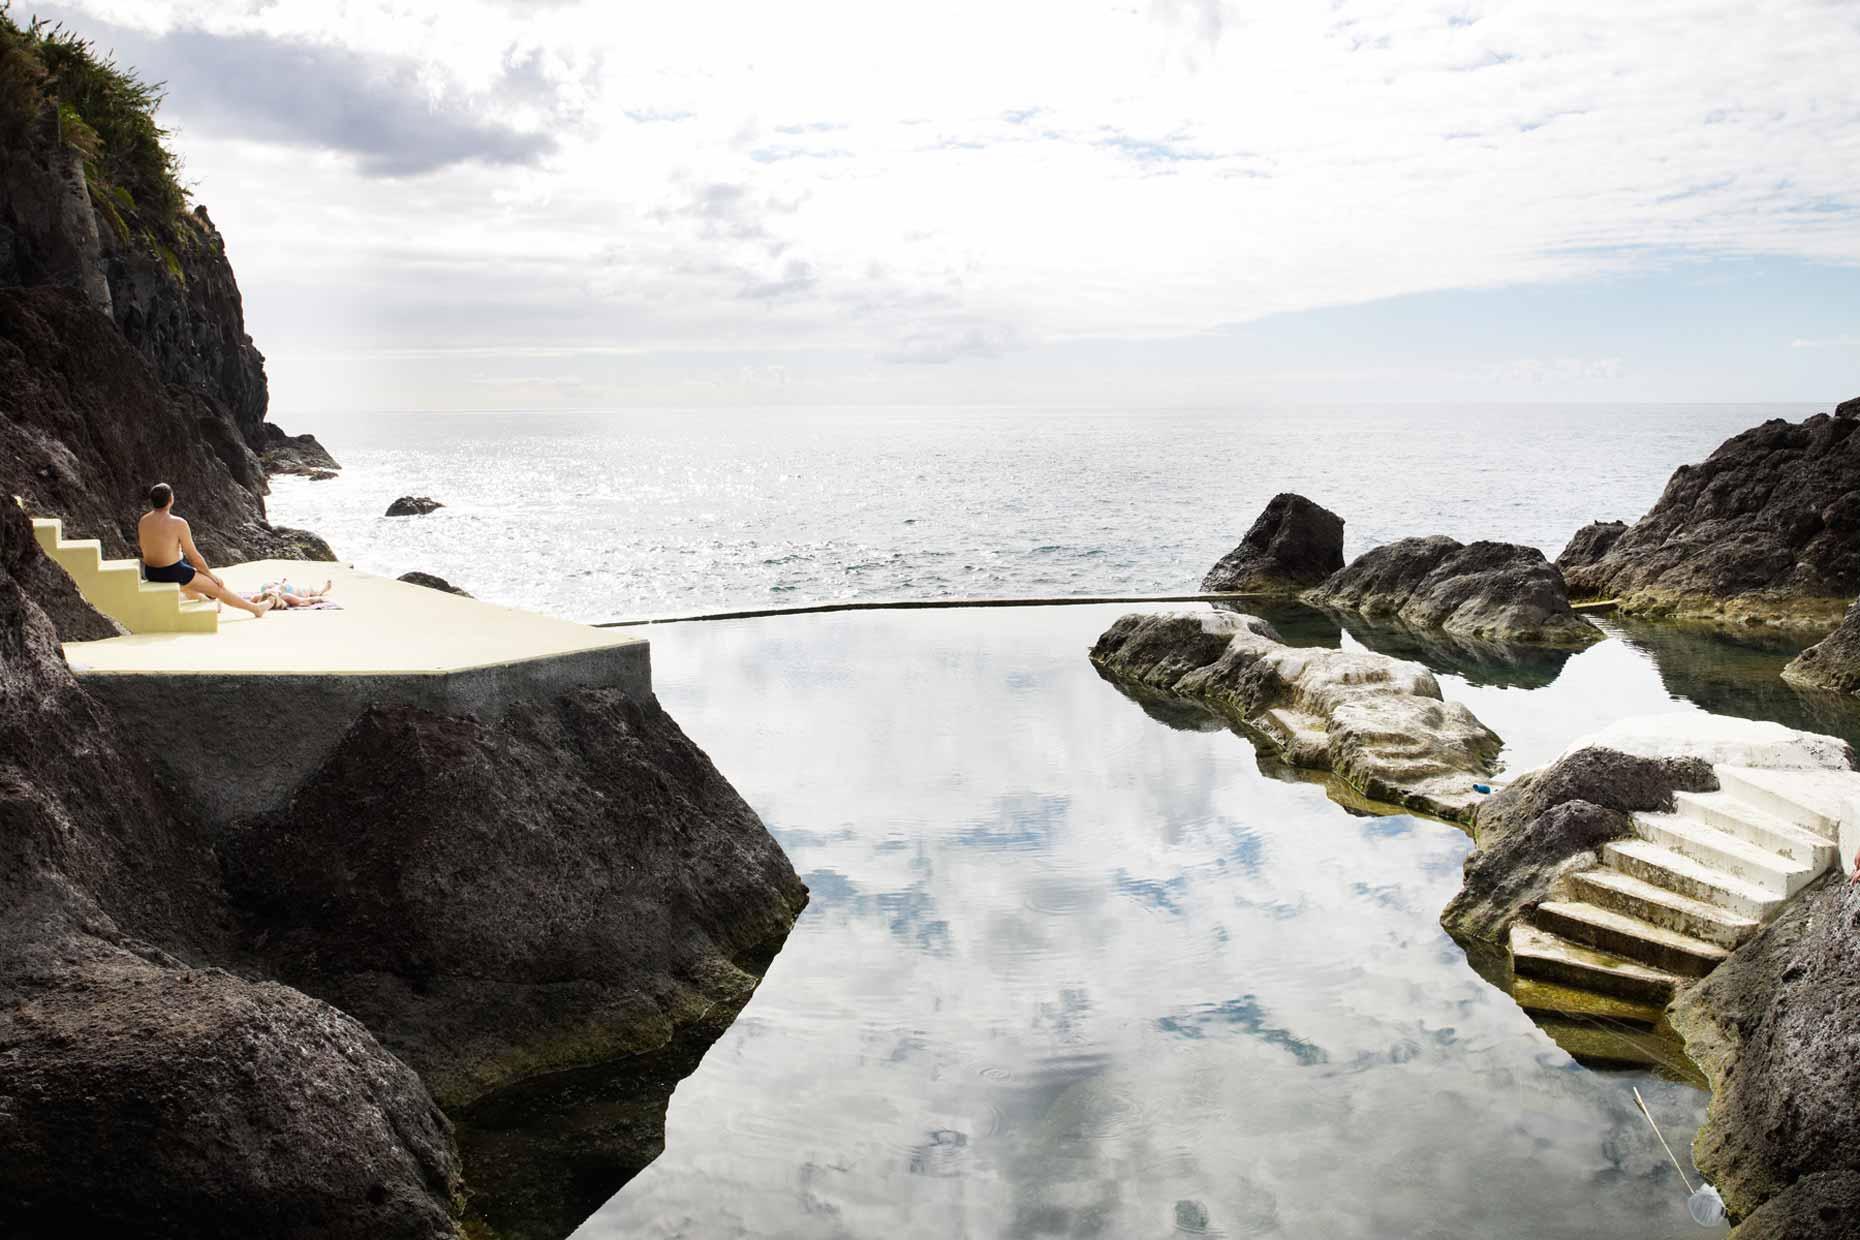 tidal-pools-portugal-pim-vuik-fotografie-film-rotterdam-01.jpg